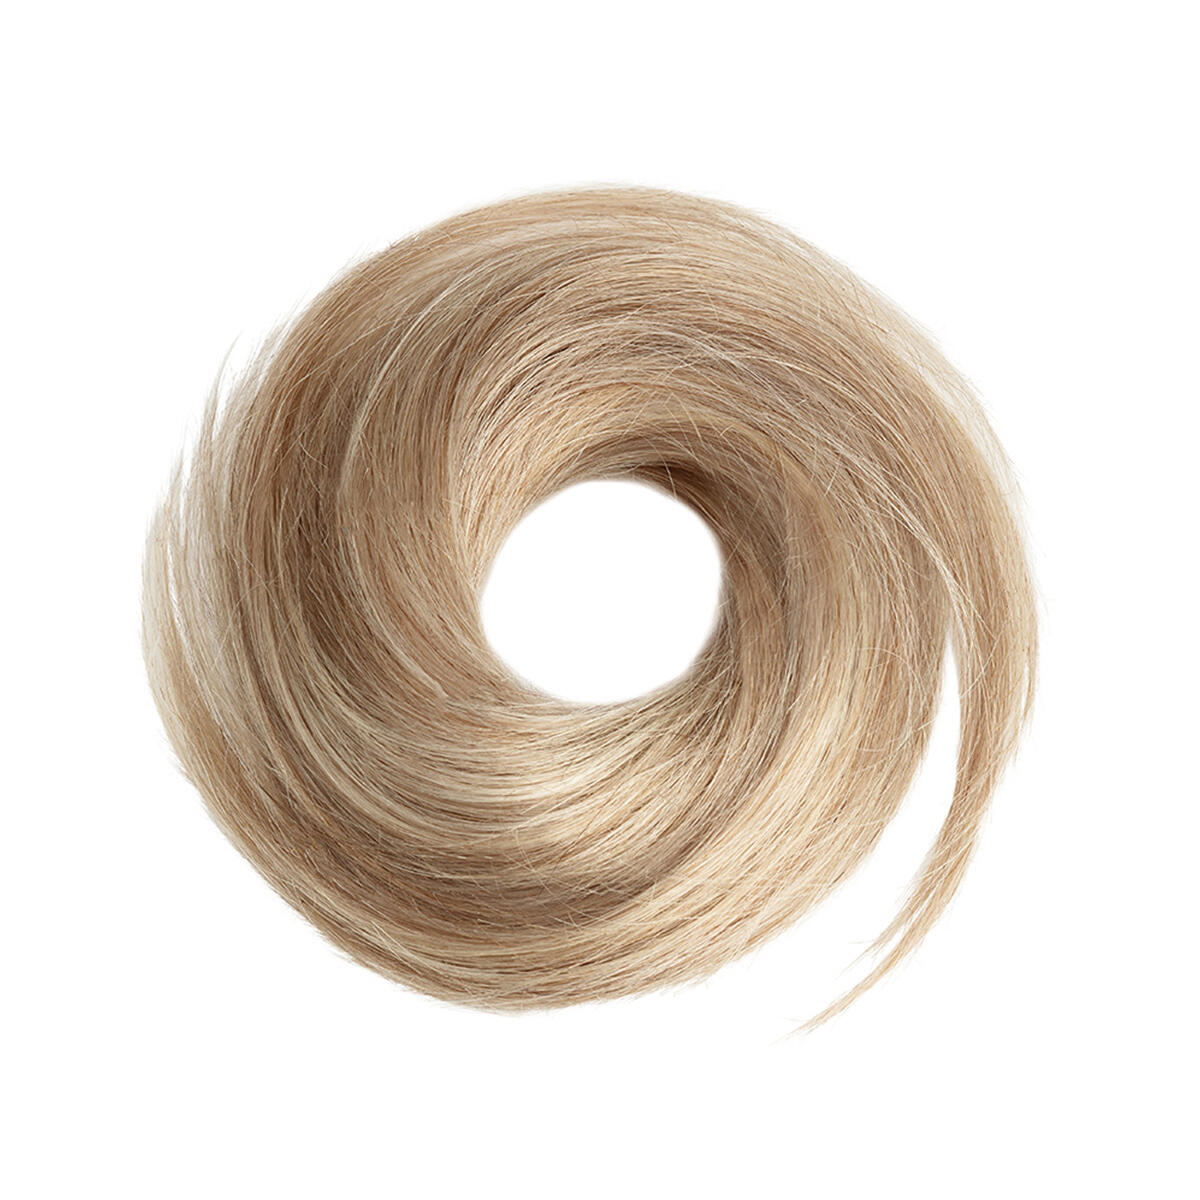 Hair Scrunchie M7.1/10.8 Natural Ash Blonde Mix